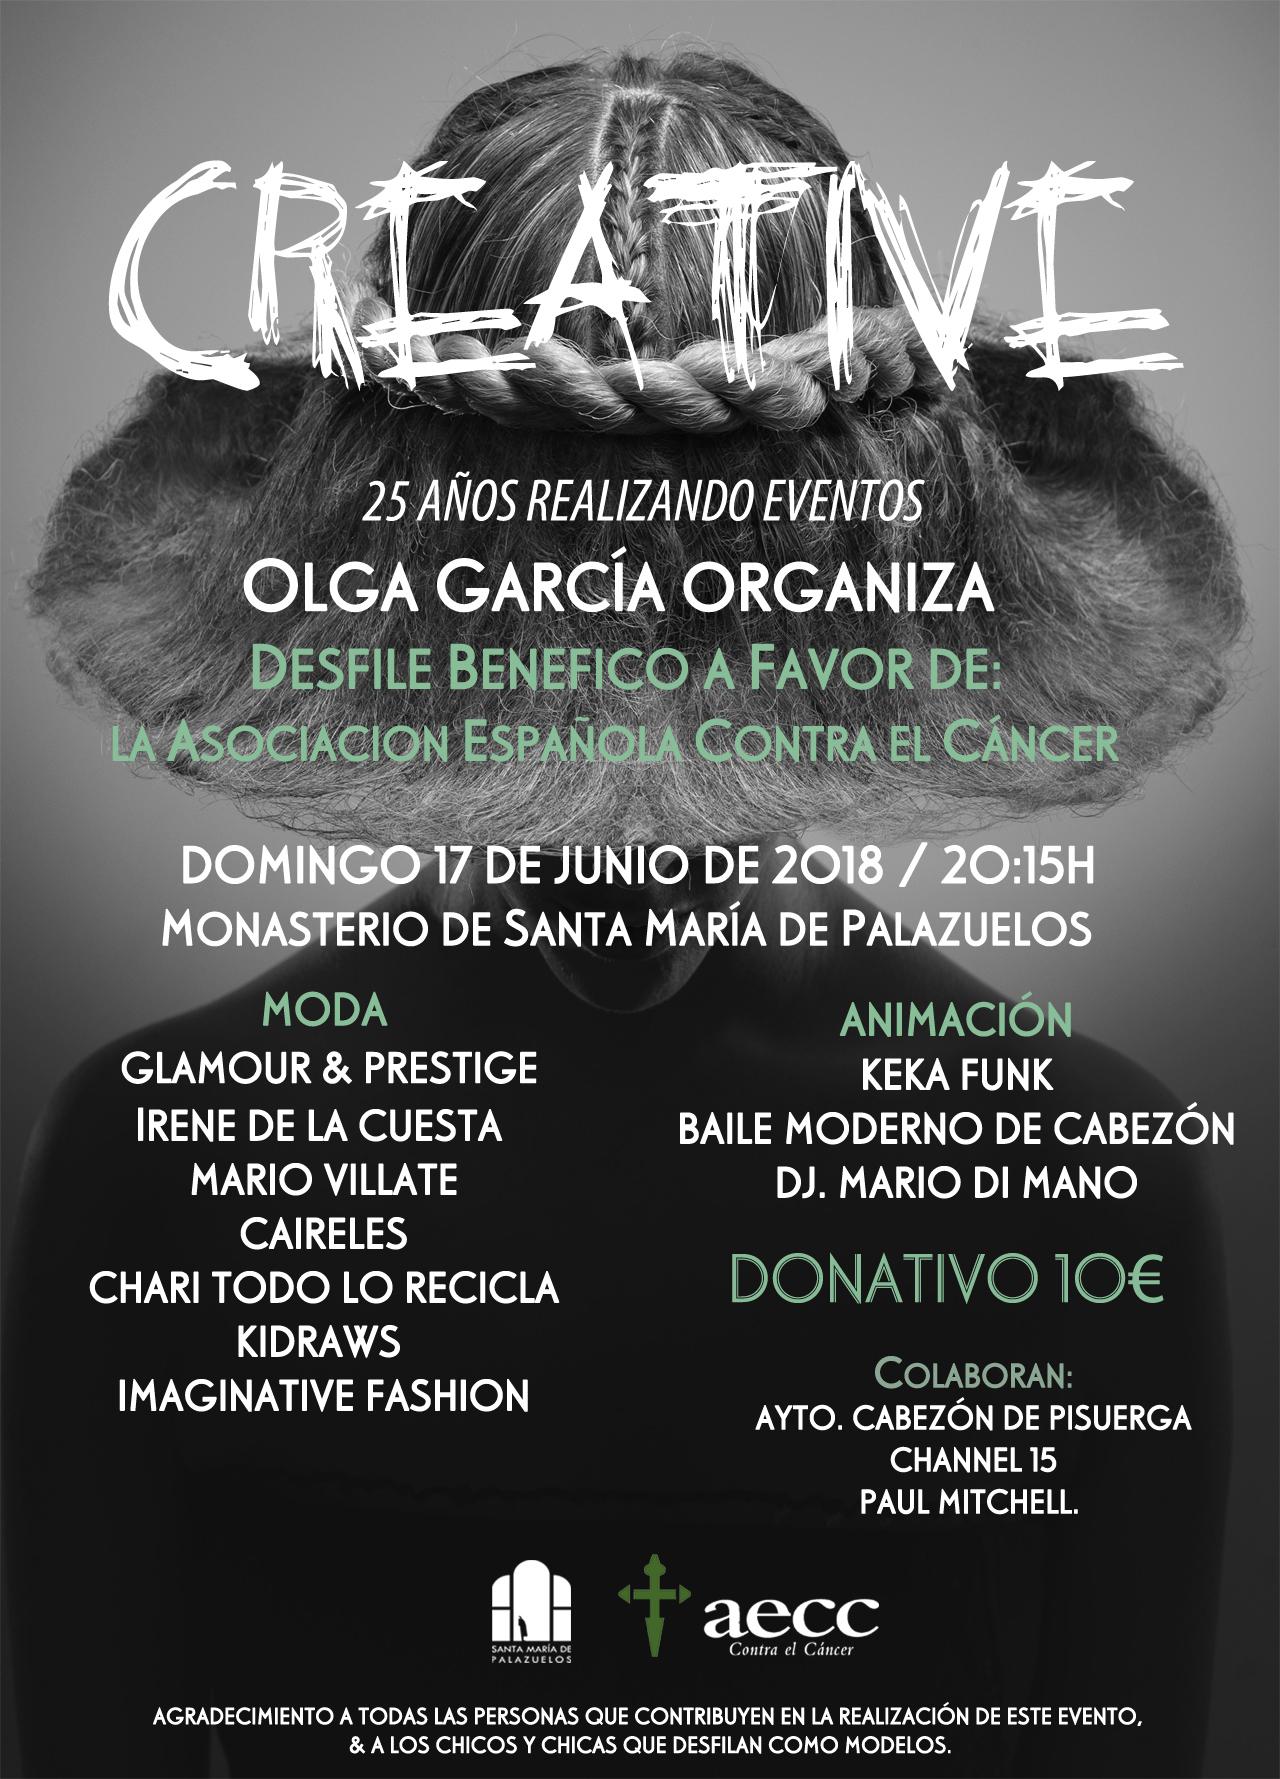 Creative 2018 v8